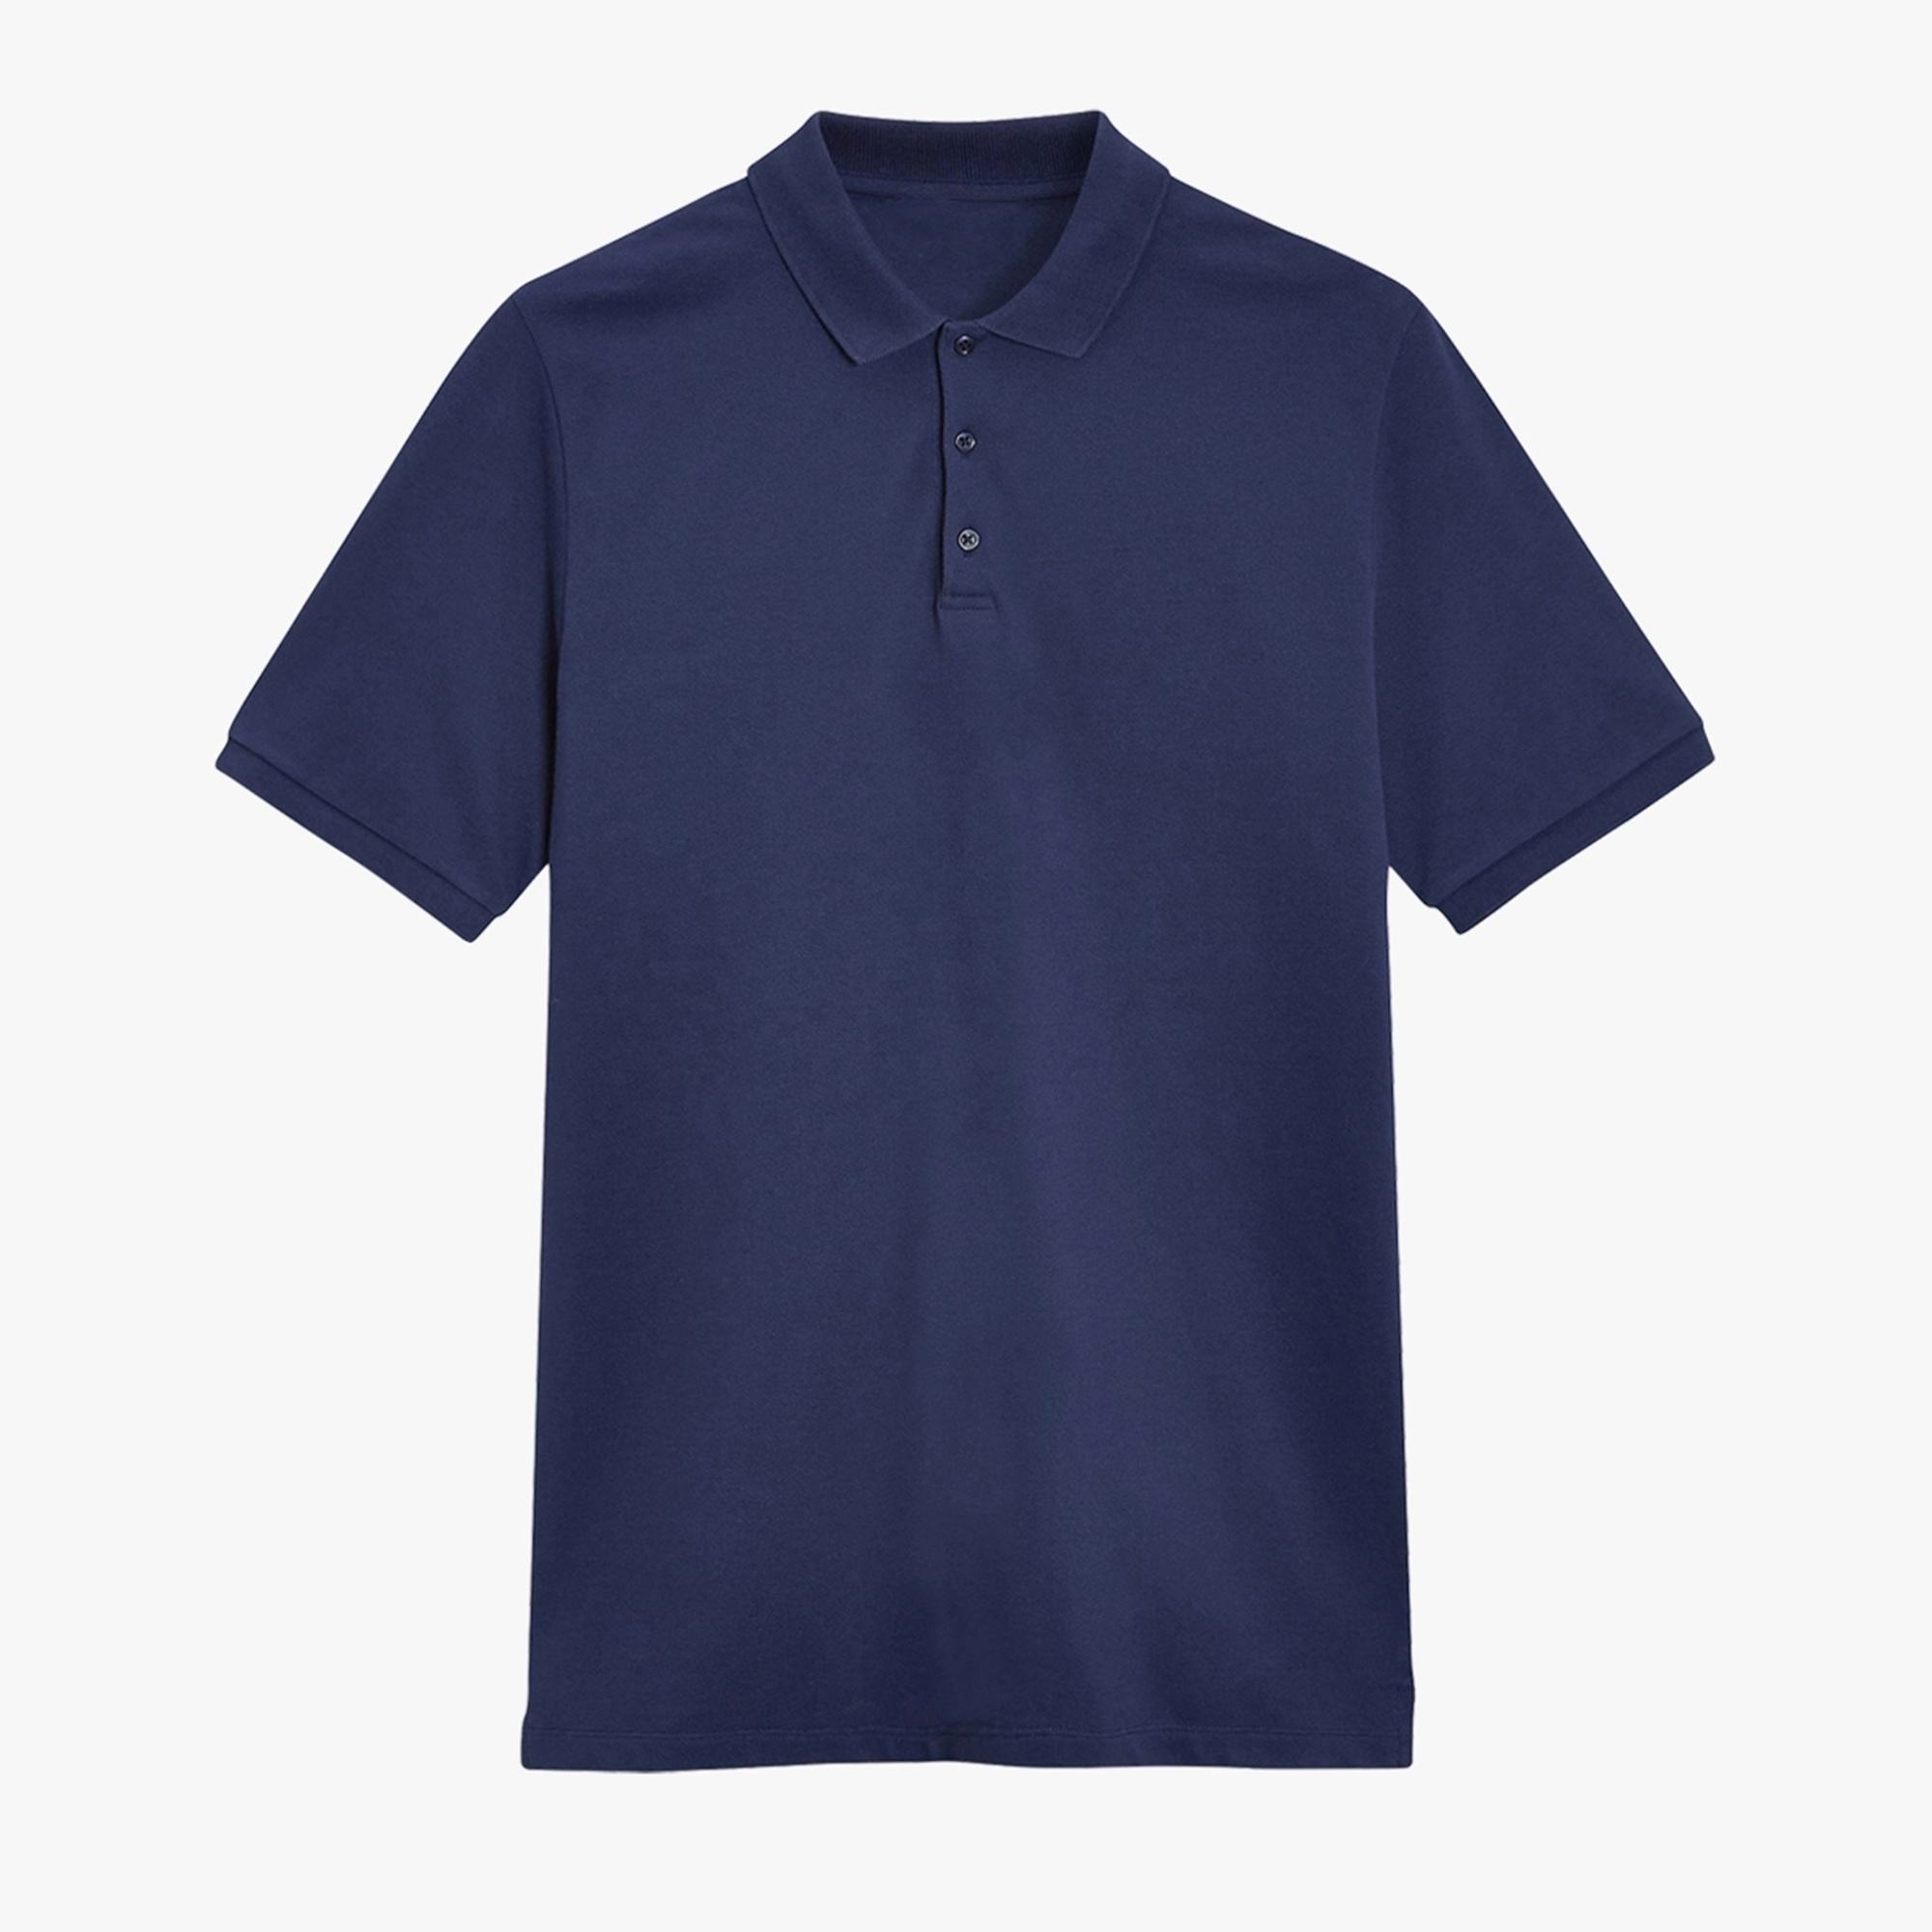 polo shirt Custom logo,Embroidery or Printing Customized logo t shirt mens polo mens Bangladesh Made